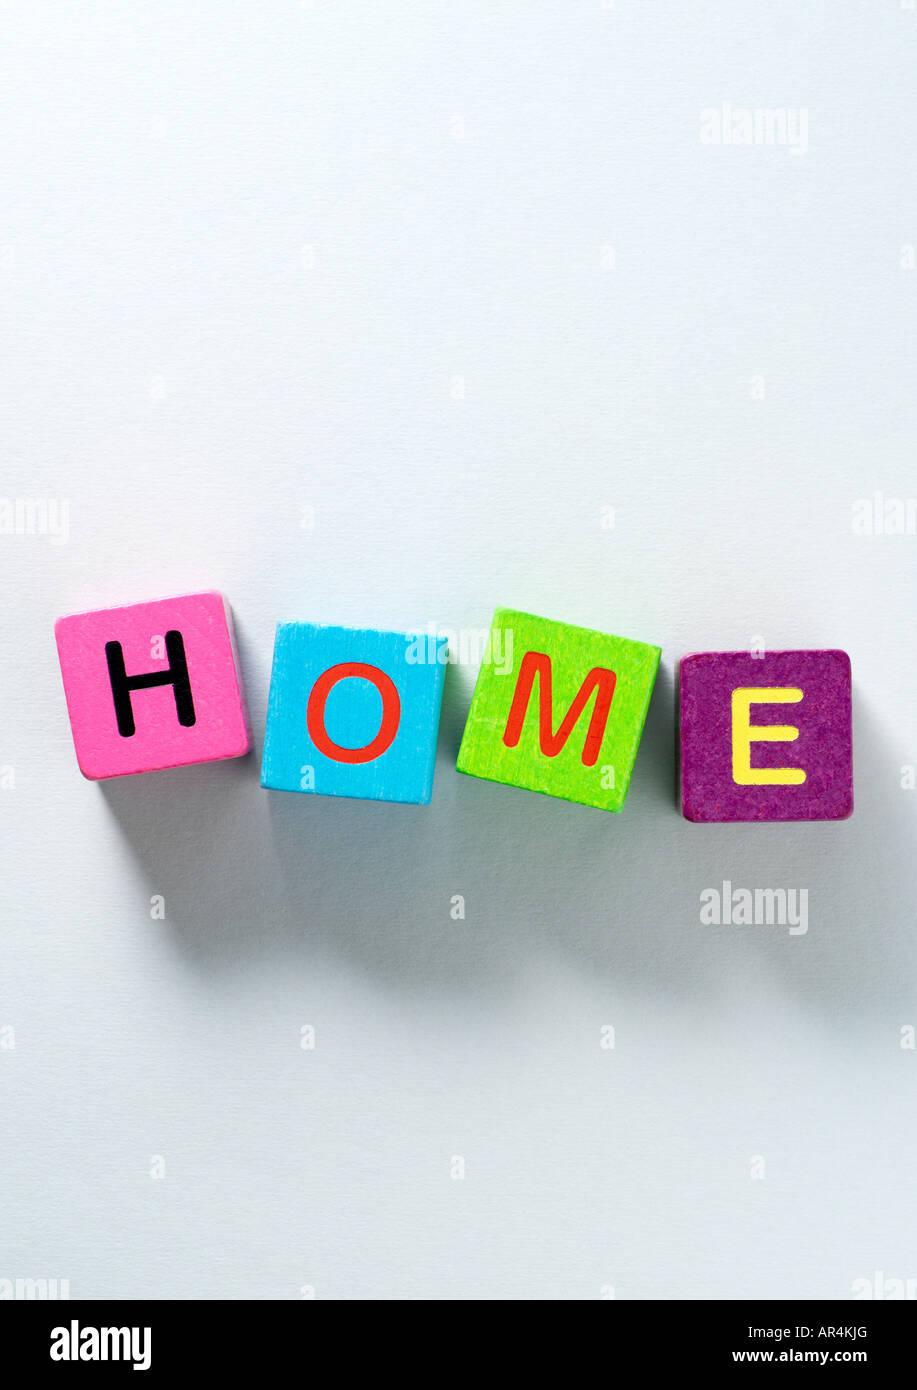 Building blocks spelling home - Stock Image